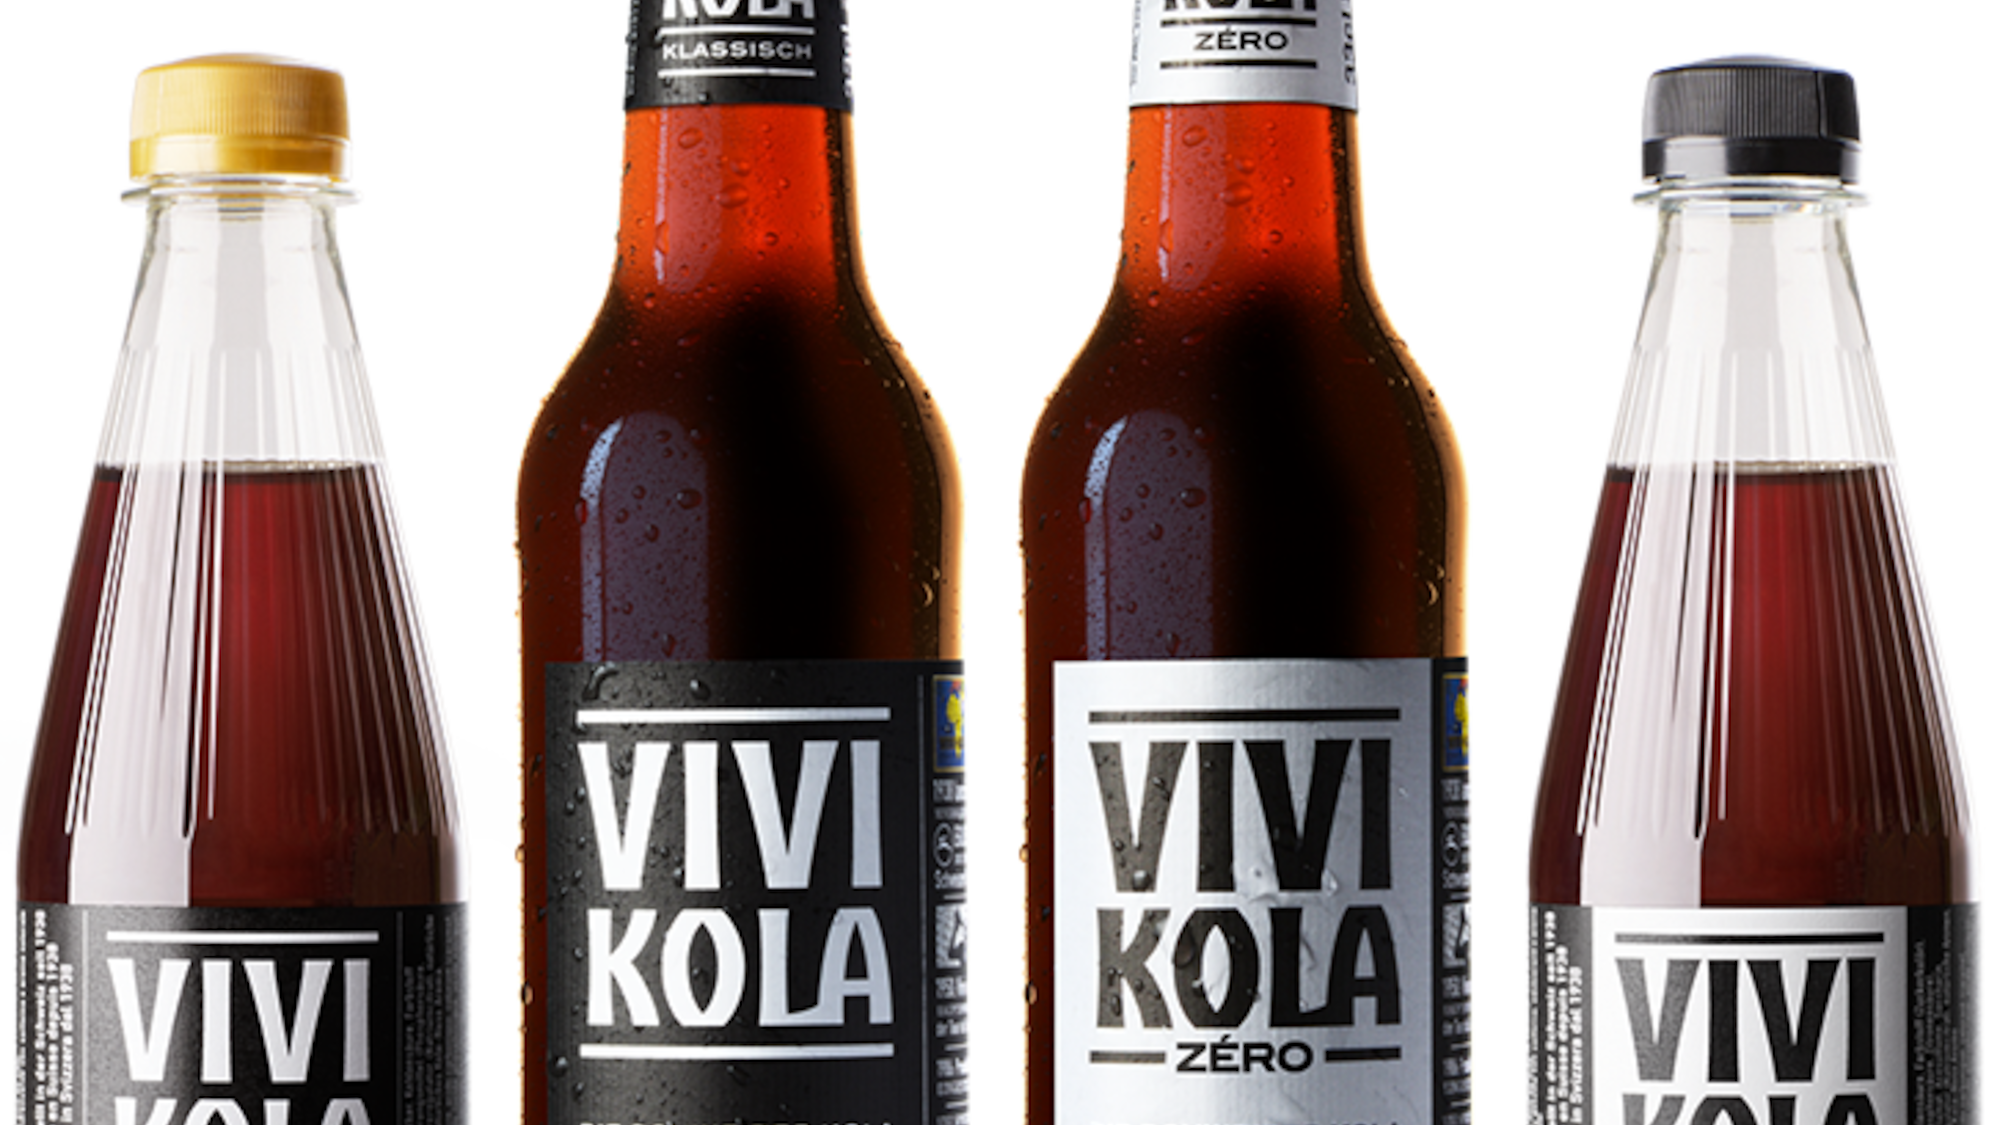 Schweizer Cola-Alternative expandiert: Vivi Kola schaffts bald nach Dubai